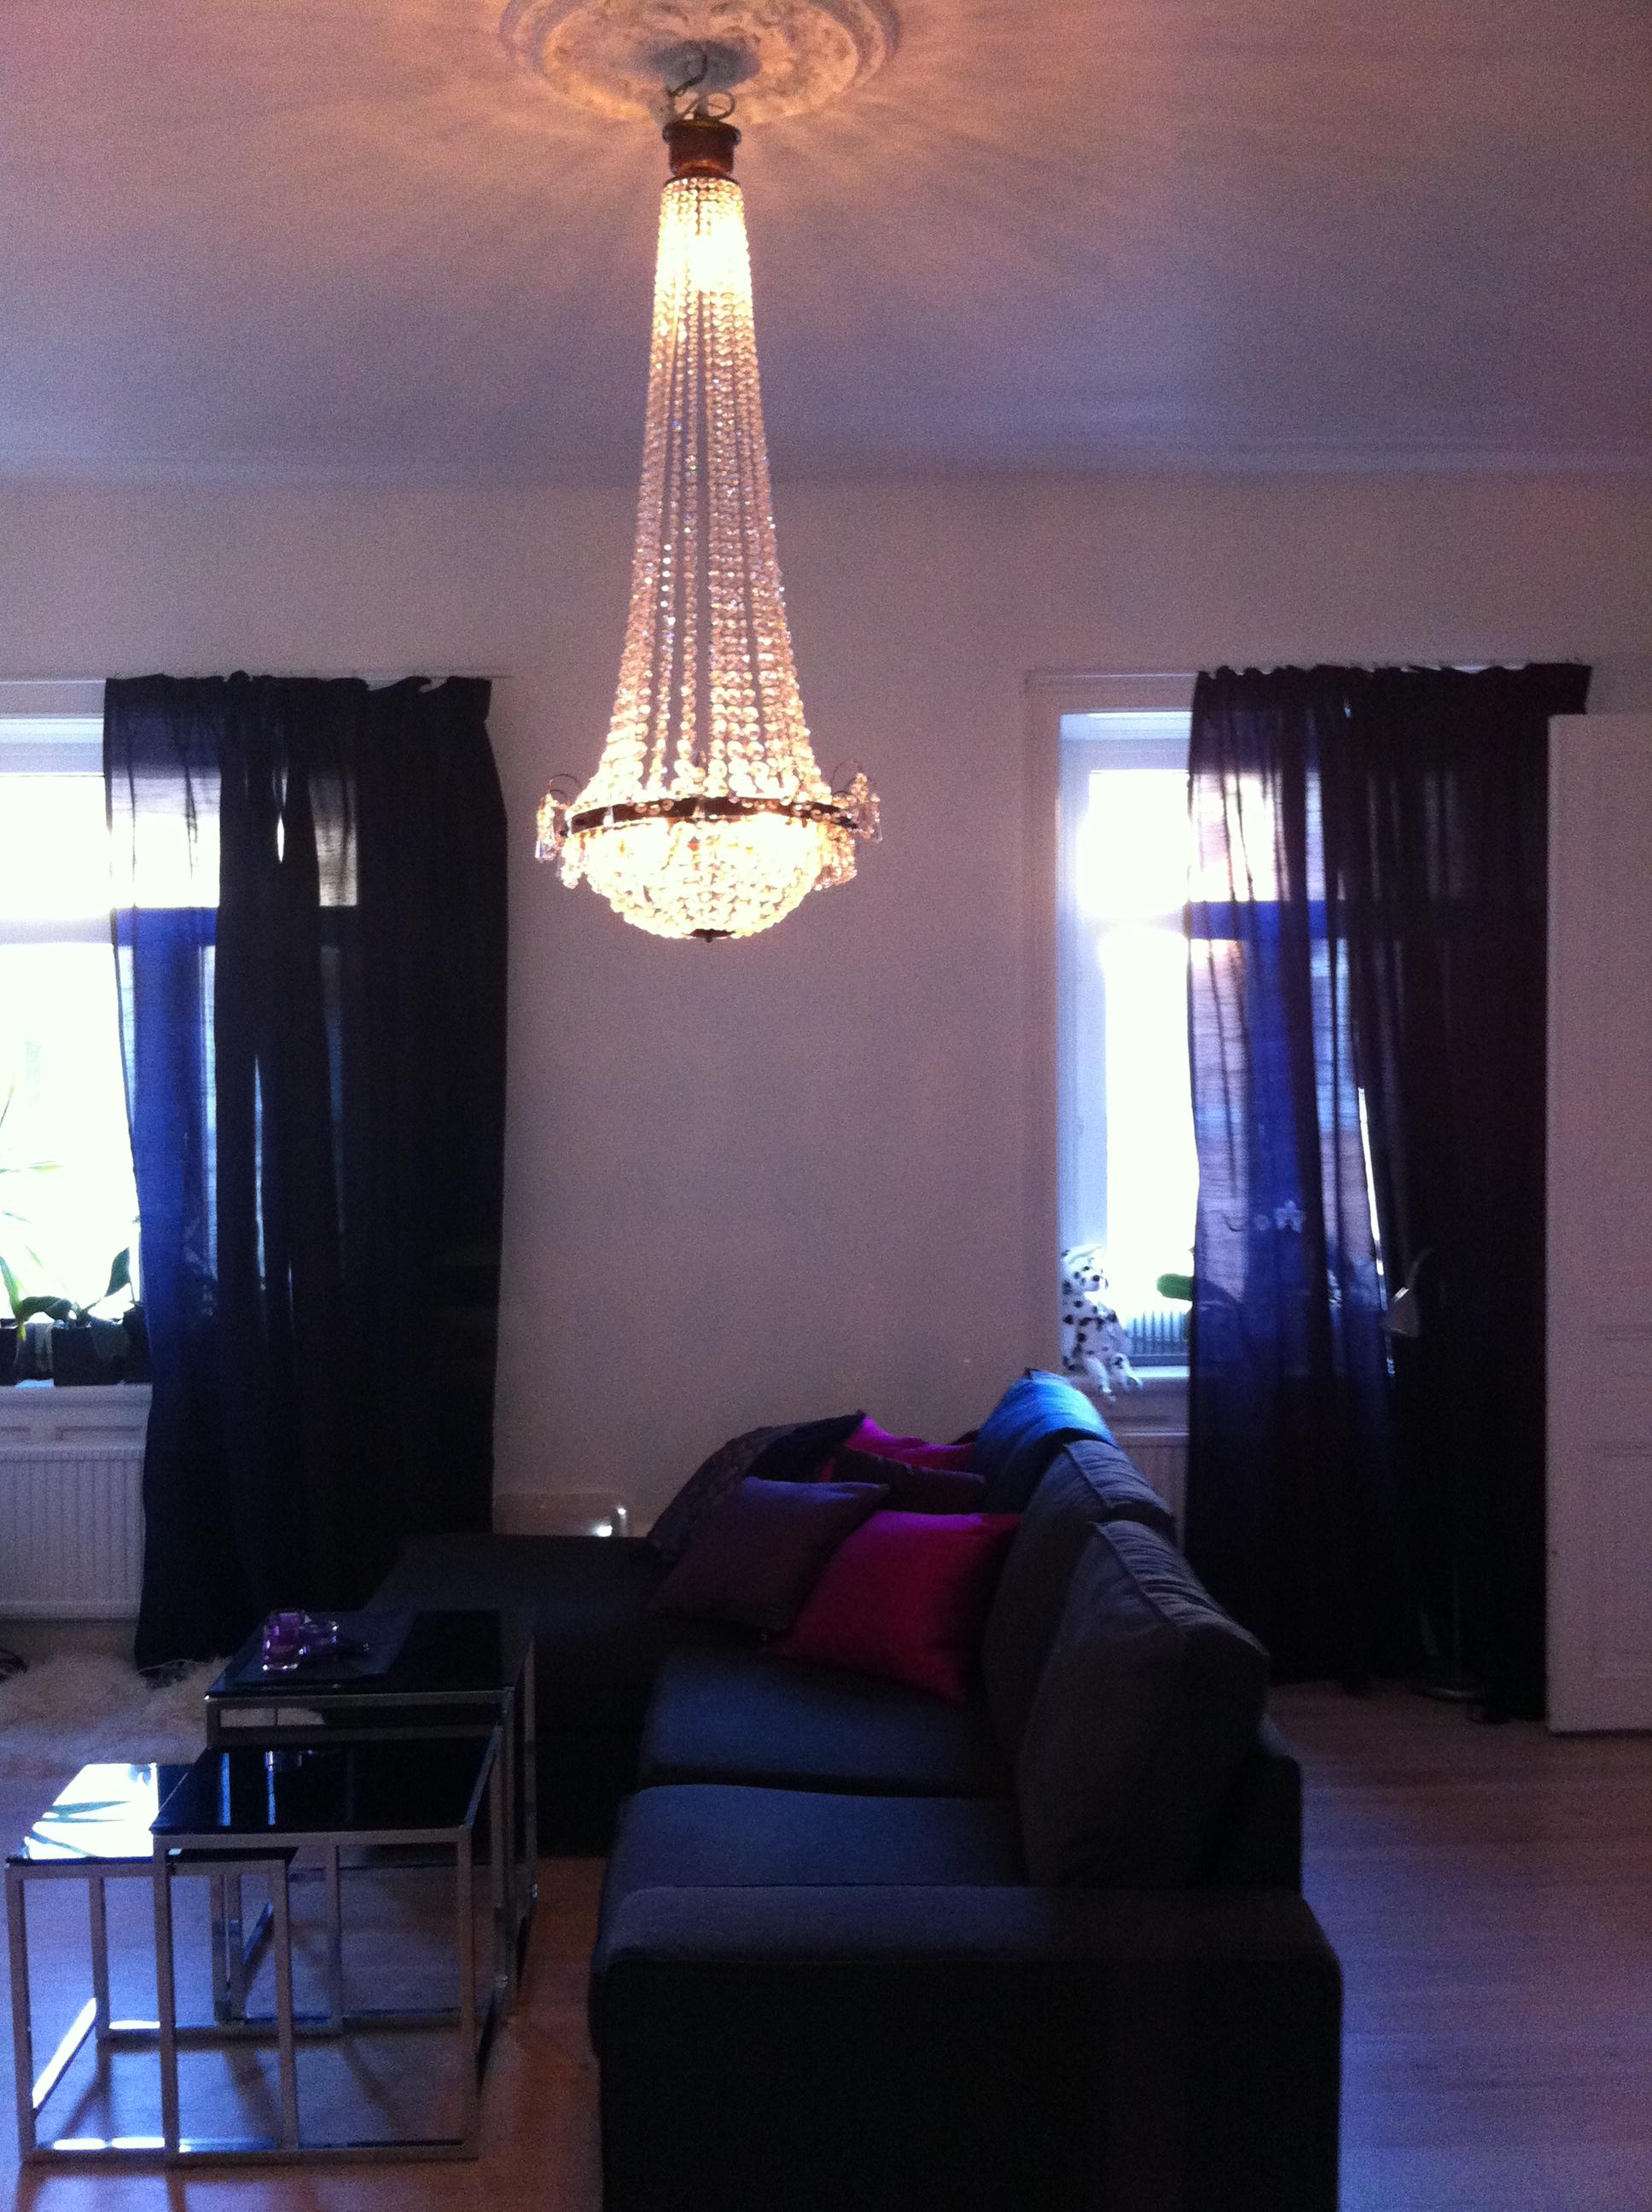 Inredning mitt vardagsrum! – inspiration inredning